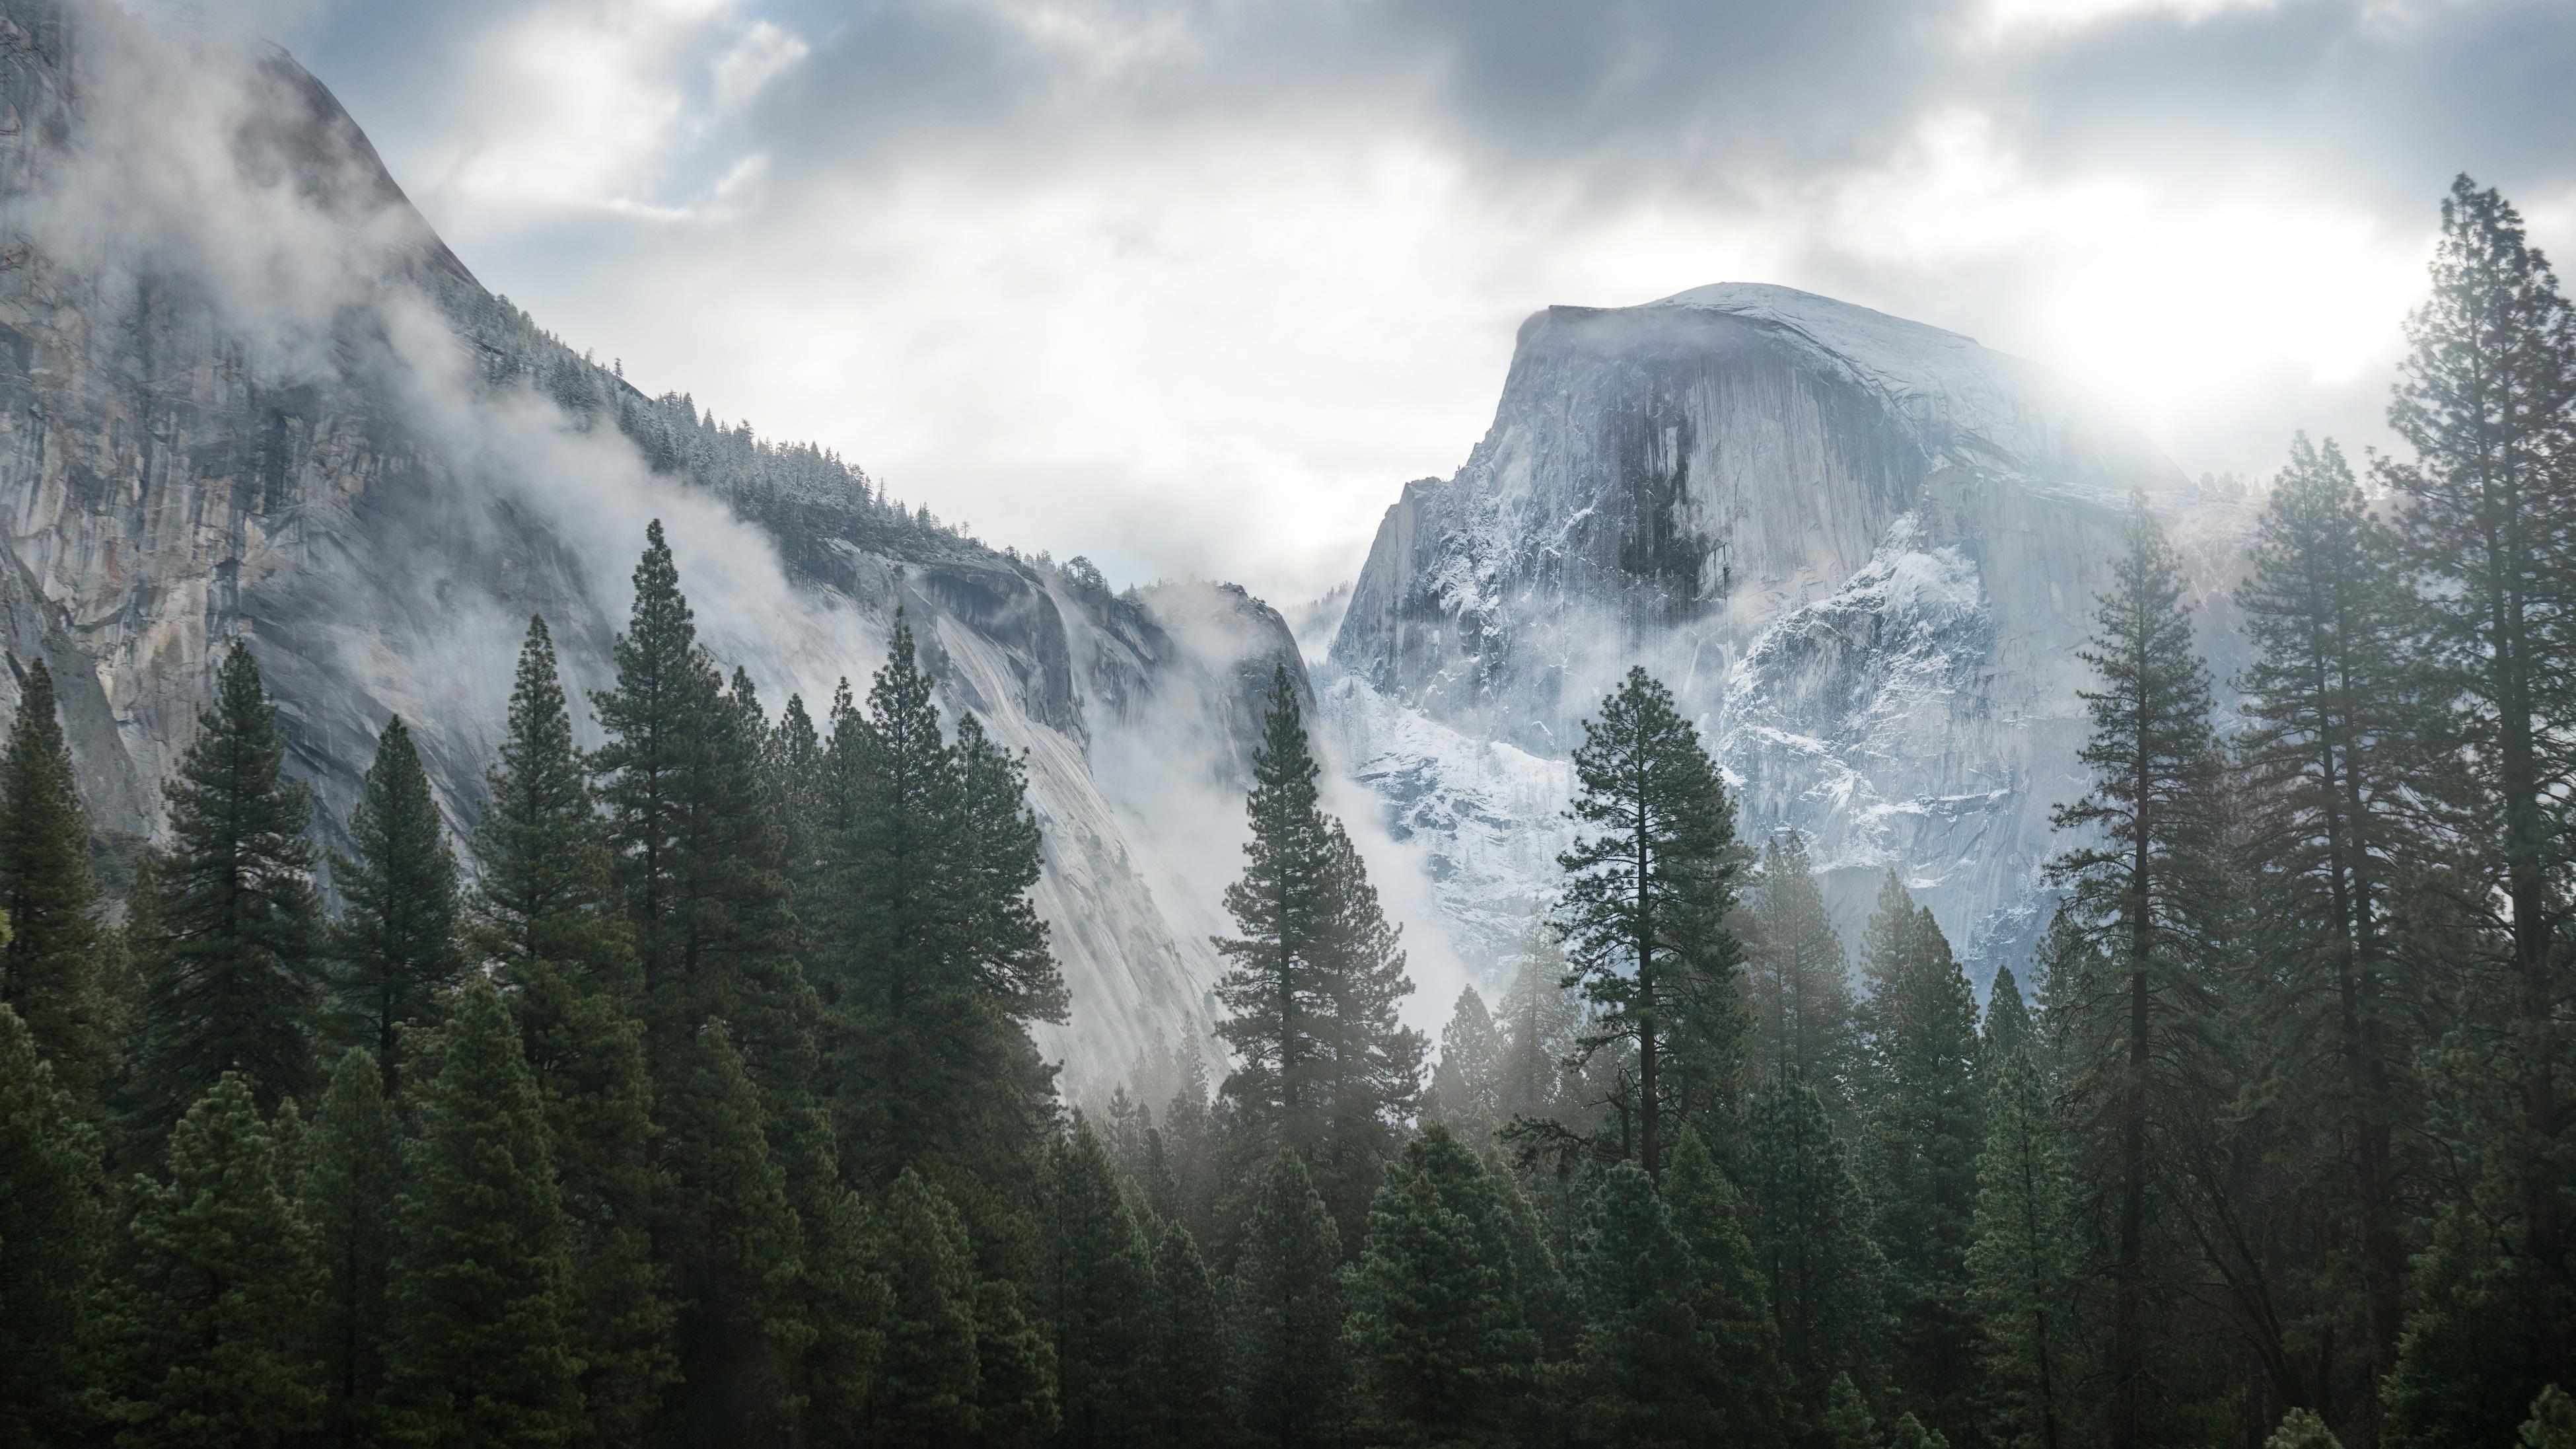 wallpapers Yosemite pour Mac OS X et iPad 3900x2193